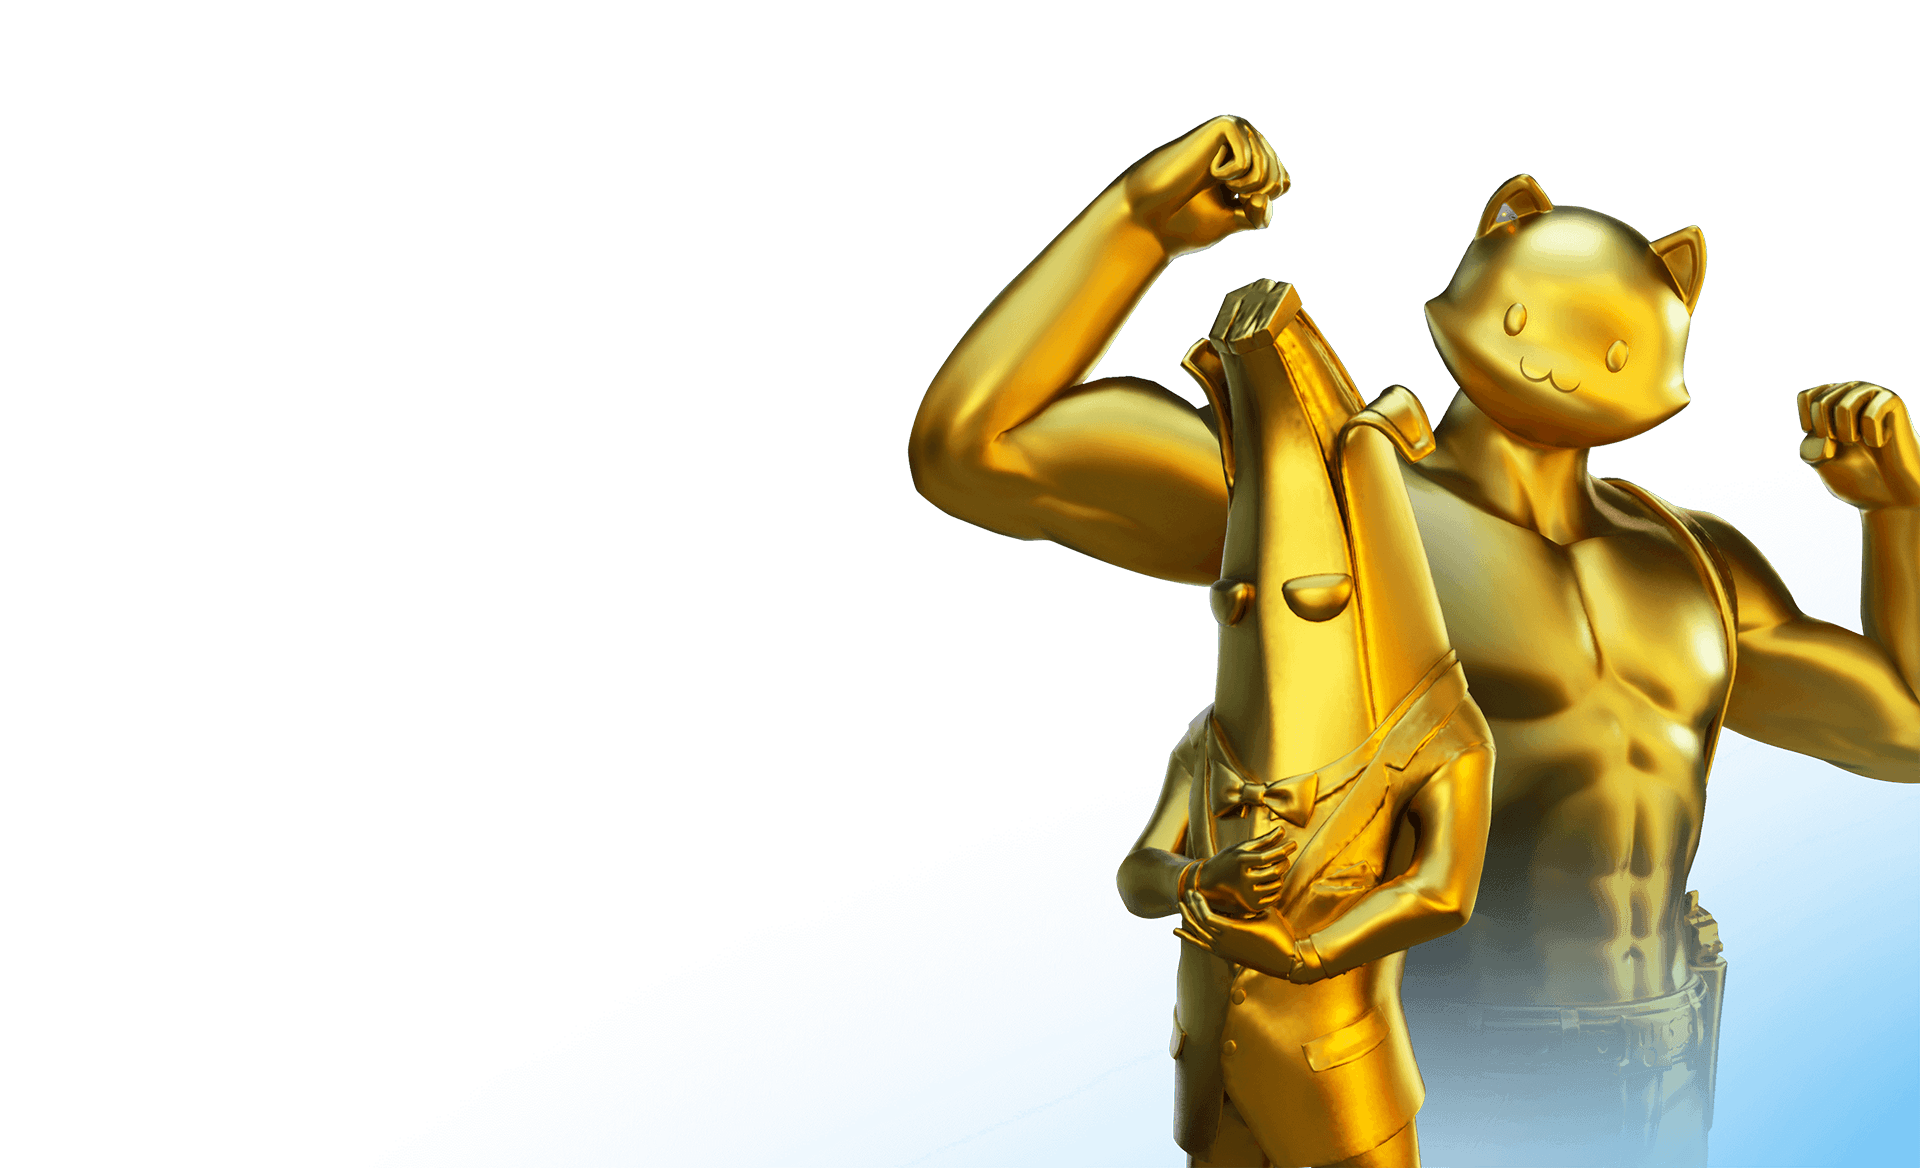 Fortnite Gold Wallpapers Wallpaper Cave